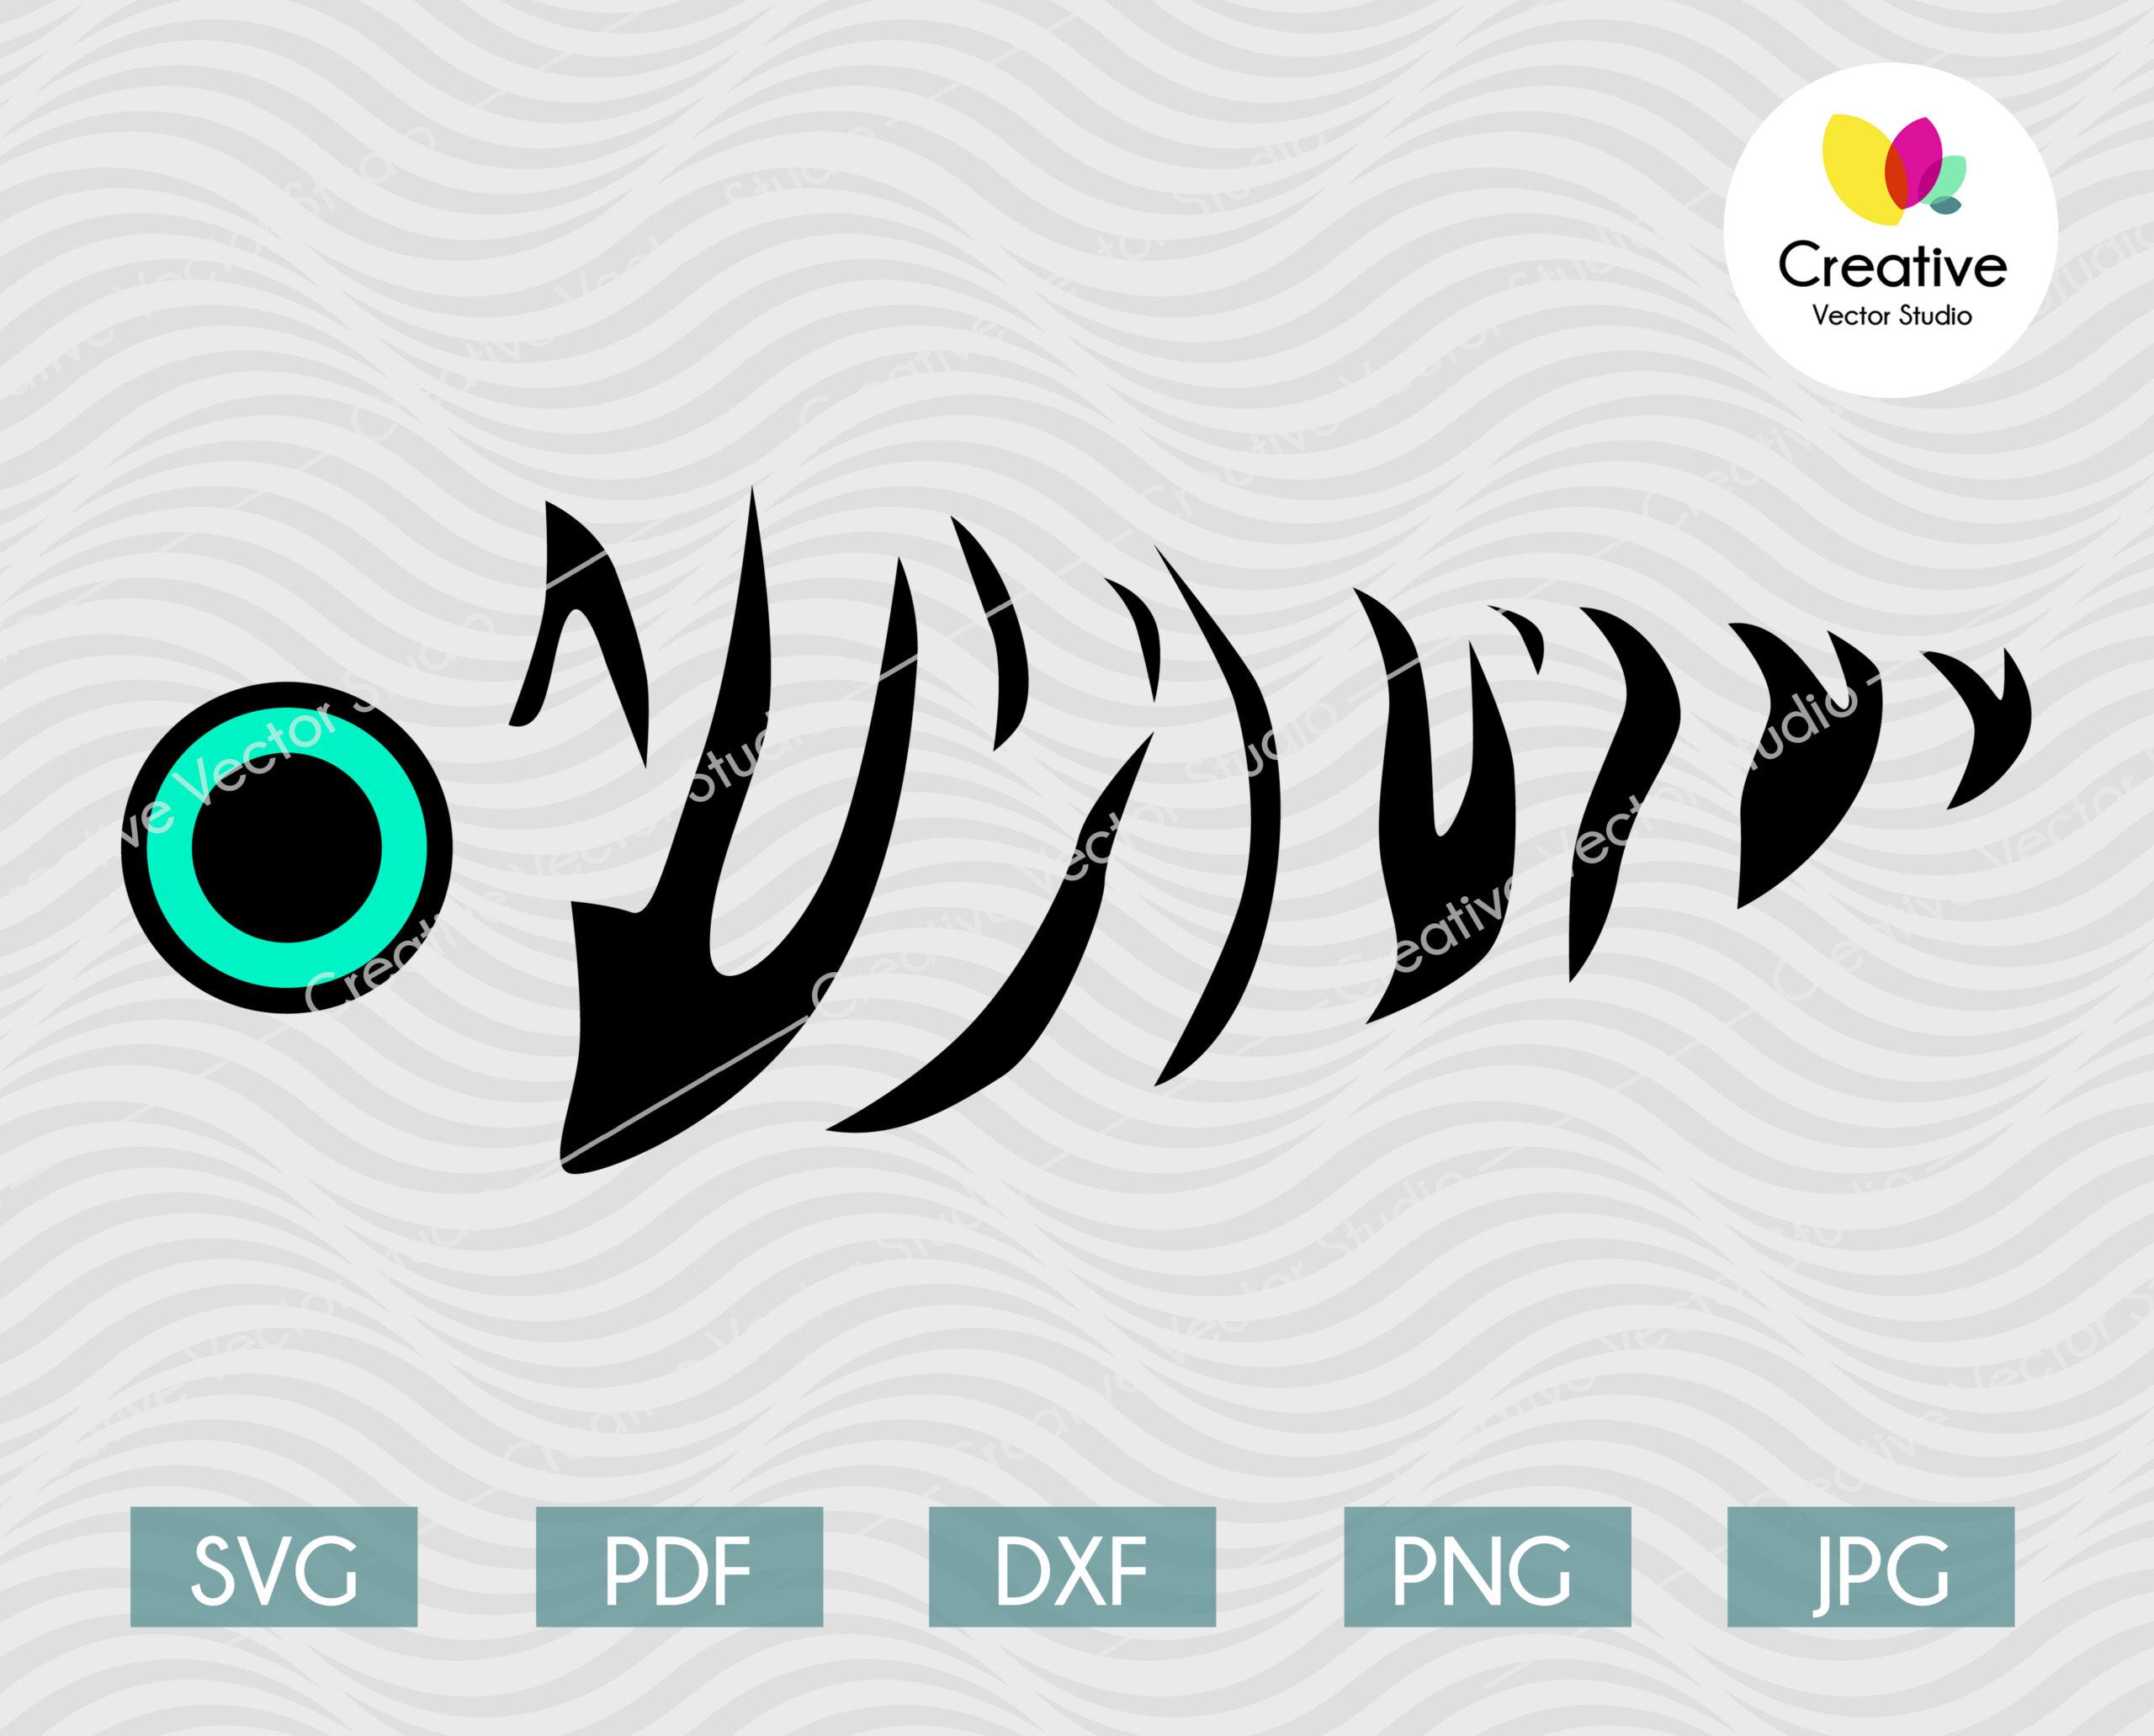 Download Fishing Lure Svg 20 Cut File Image Creative Vector Studio